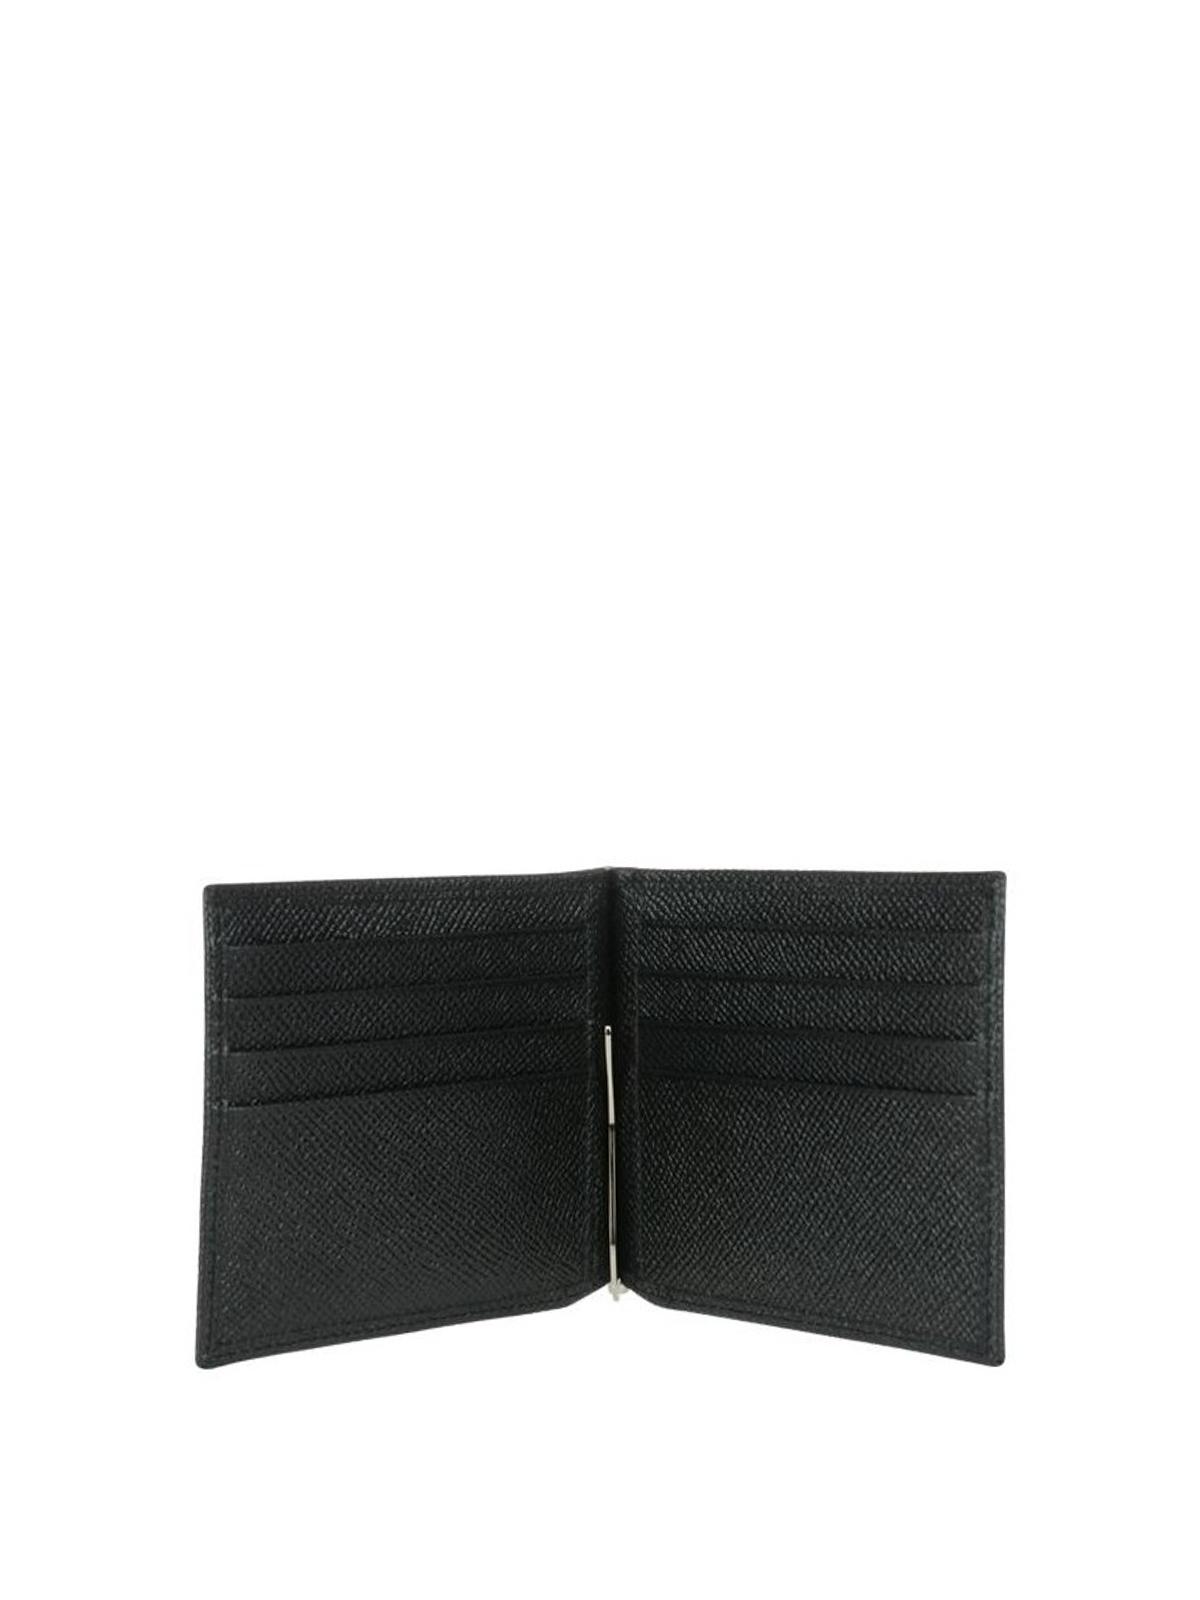 Dolce   Gabbana - Portafoglio D G con fermasoldi - portafogli ... 8eebd582895